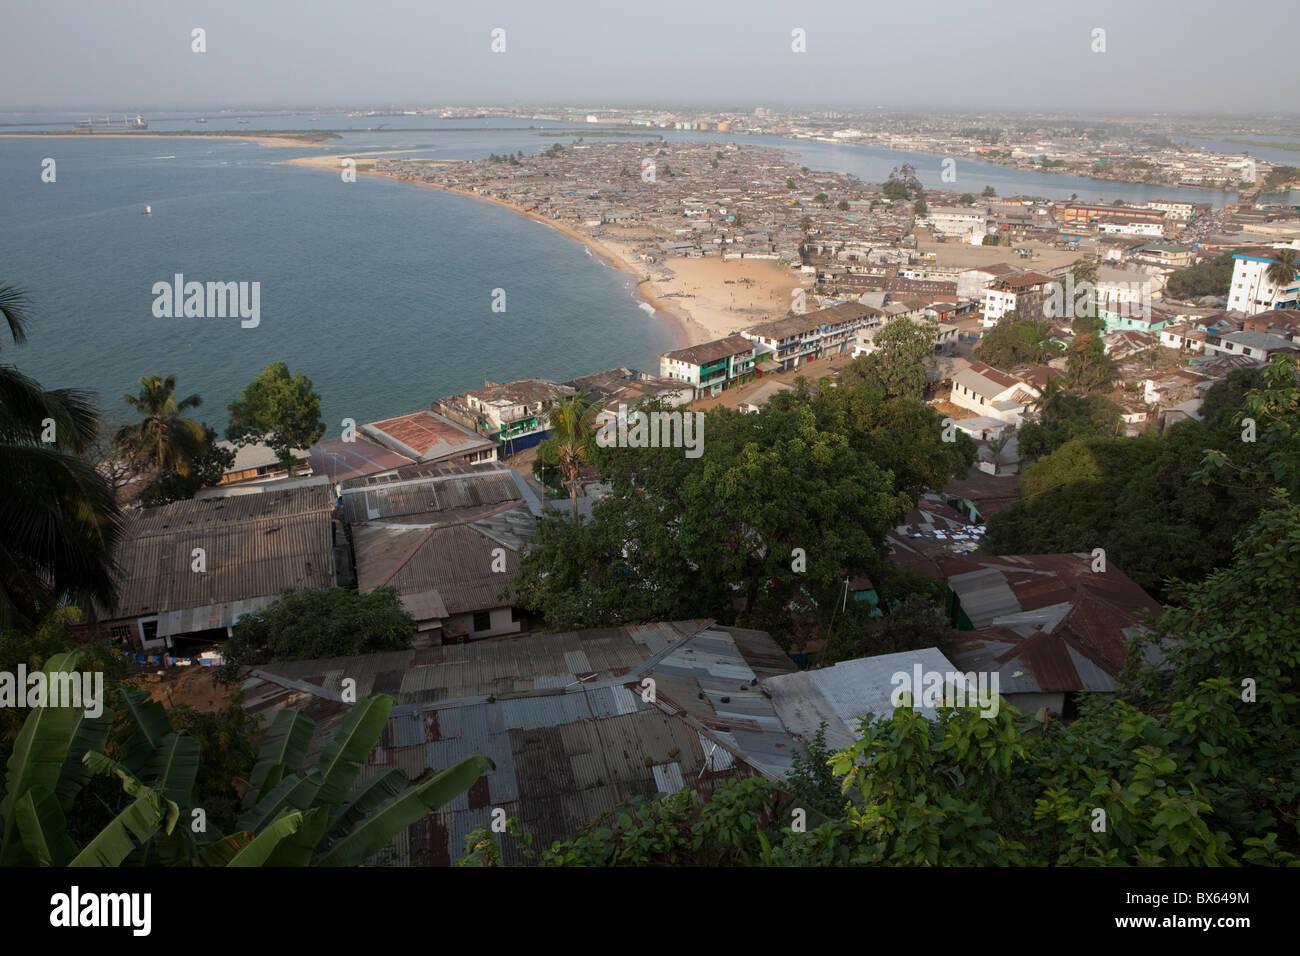 Monrovia, Liberia oceanfront showing Waterside and the Mesurado Penninsula. West Africa. - Stock Image